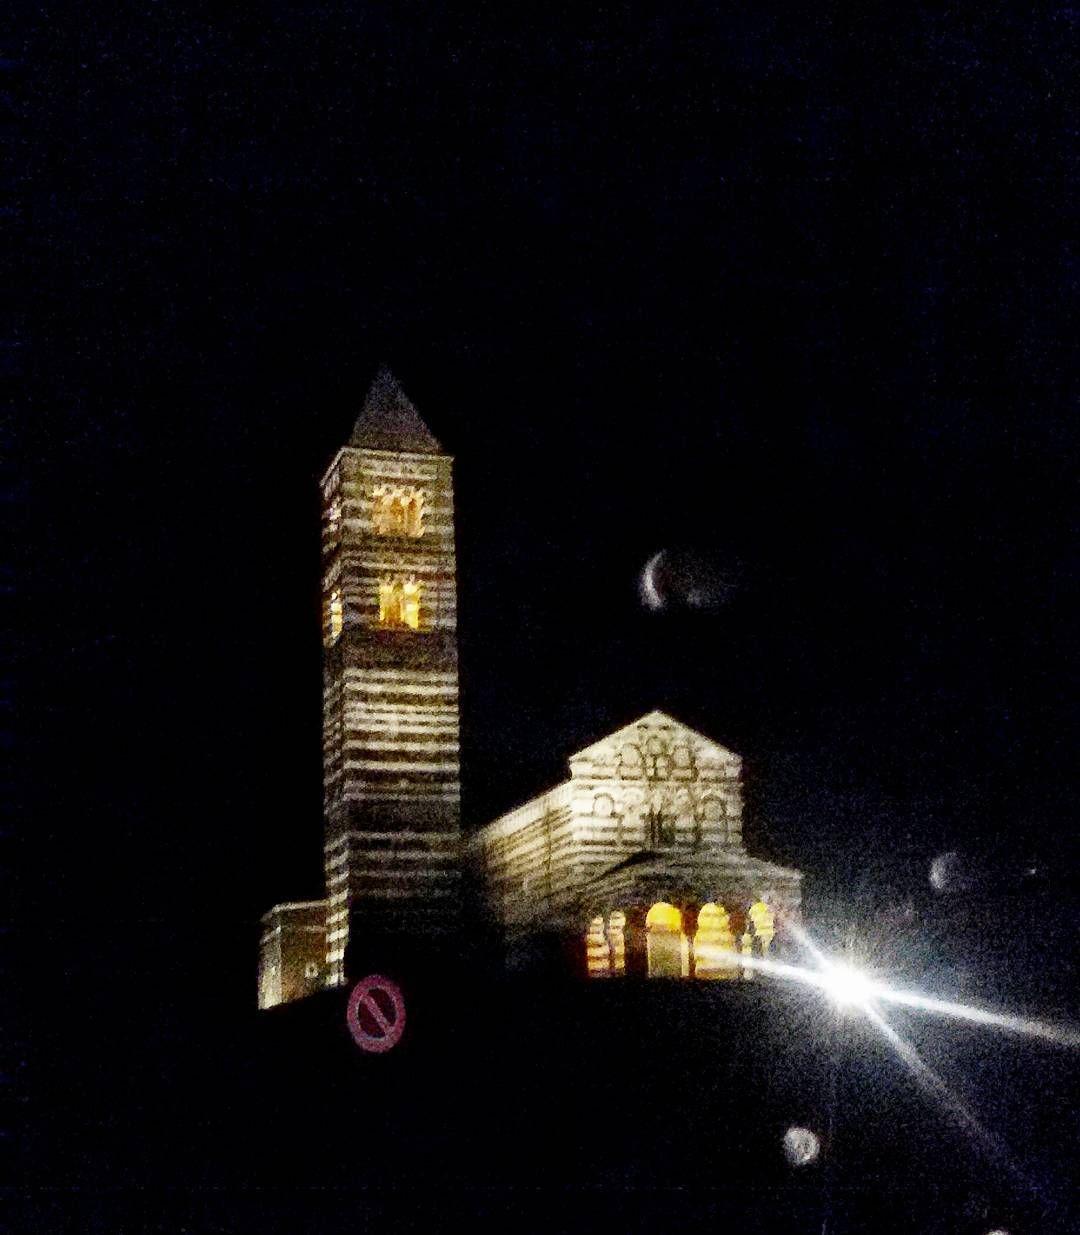 Foto in Sardegna: #saccargia #onnight #church #sardinia #sardiniaexperience - via http://ift.tt/1zN1qff e #traveloffers #holiday | offerte di turismo in Sardegna: http://ift.tt/23nmf3B -